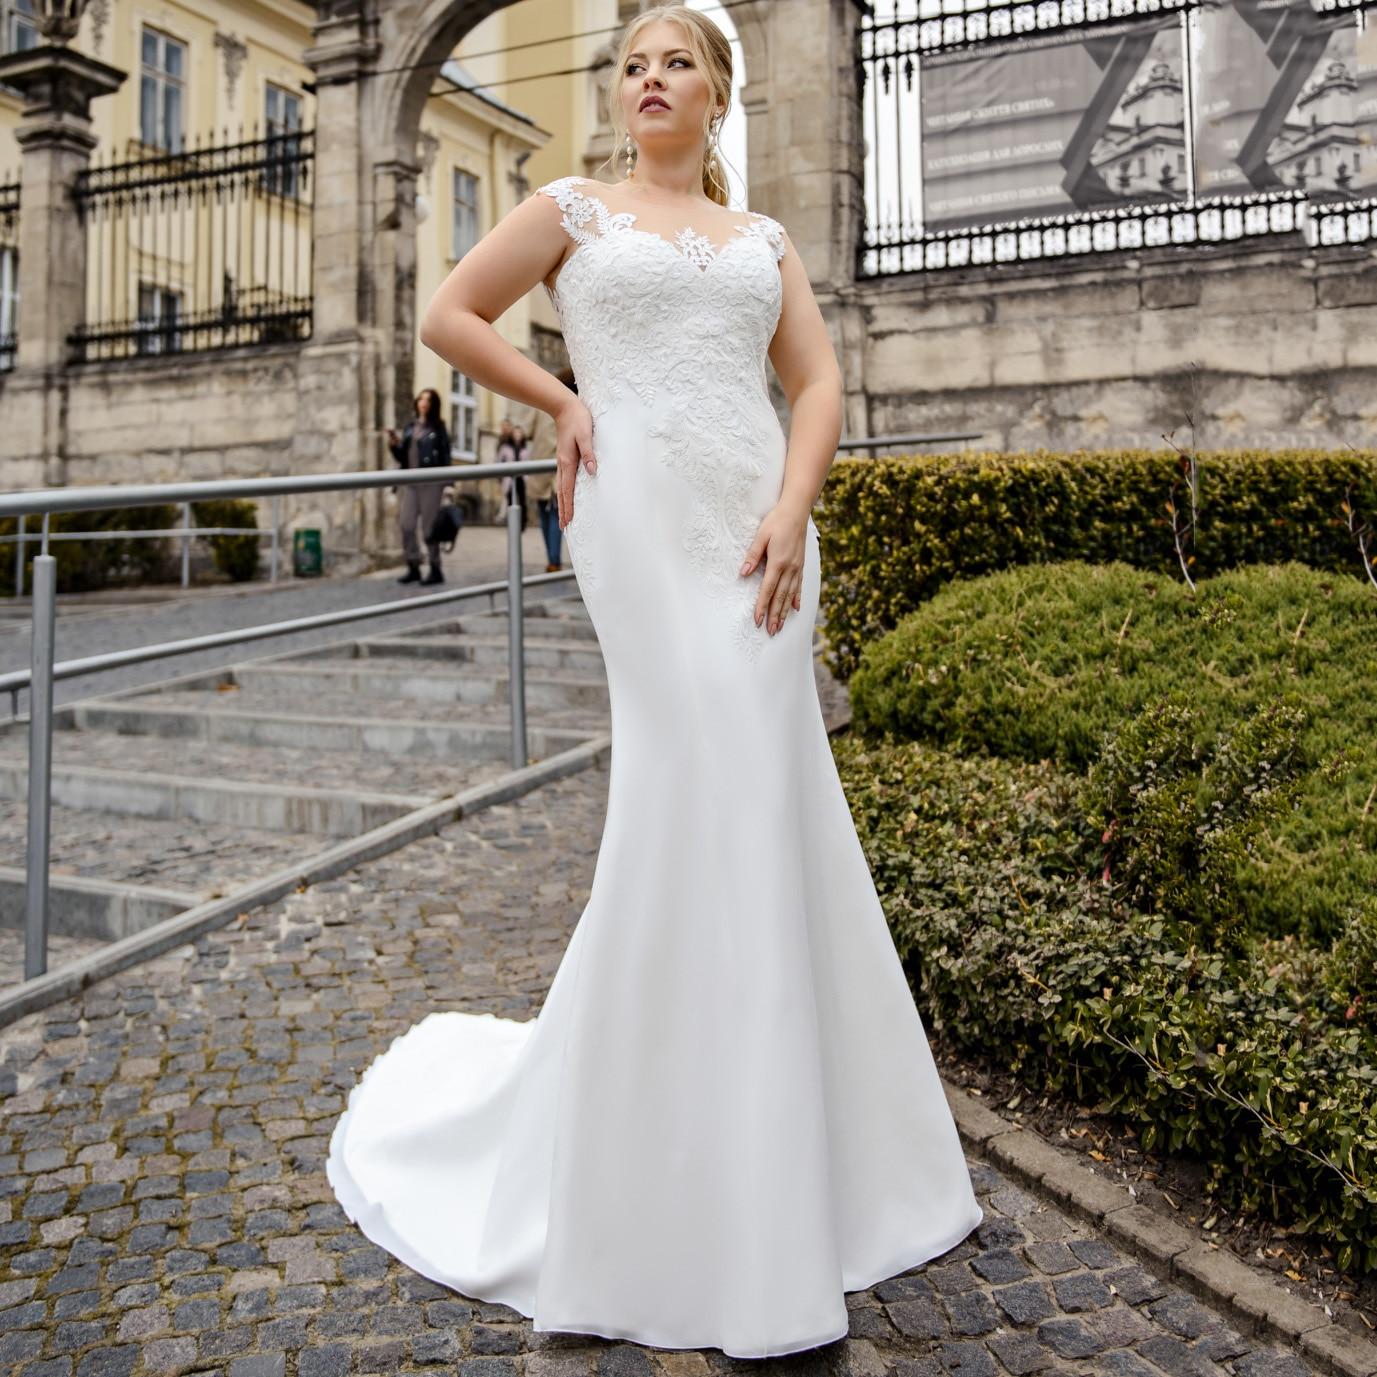 Mermaid Custom Made Plus Size Chiffon Wedding Dress Lace Appliques Illusion Tulle Back Bride Dress For Big Size Women